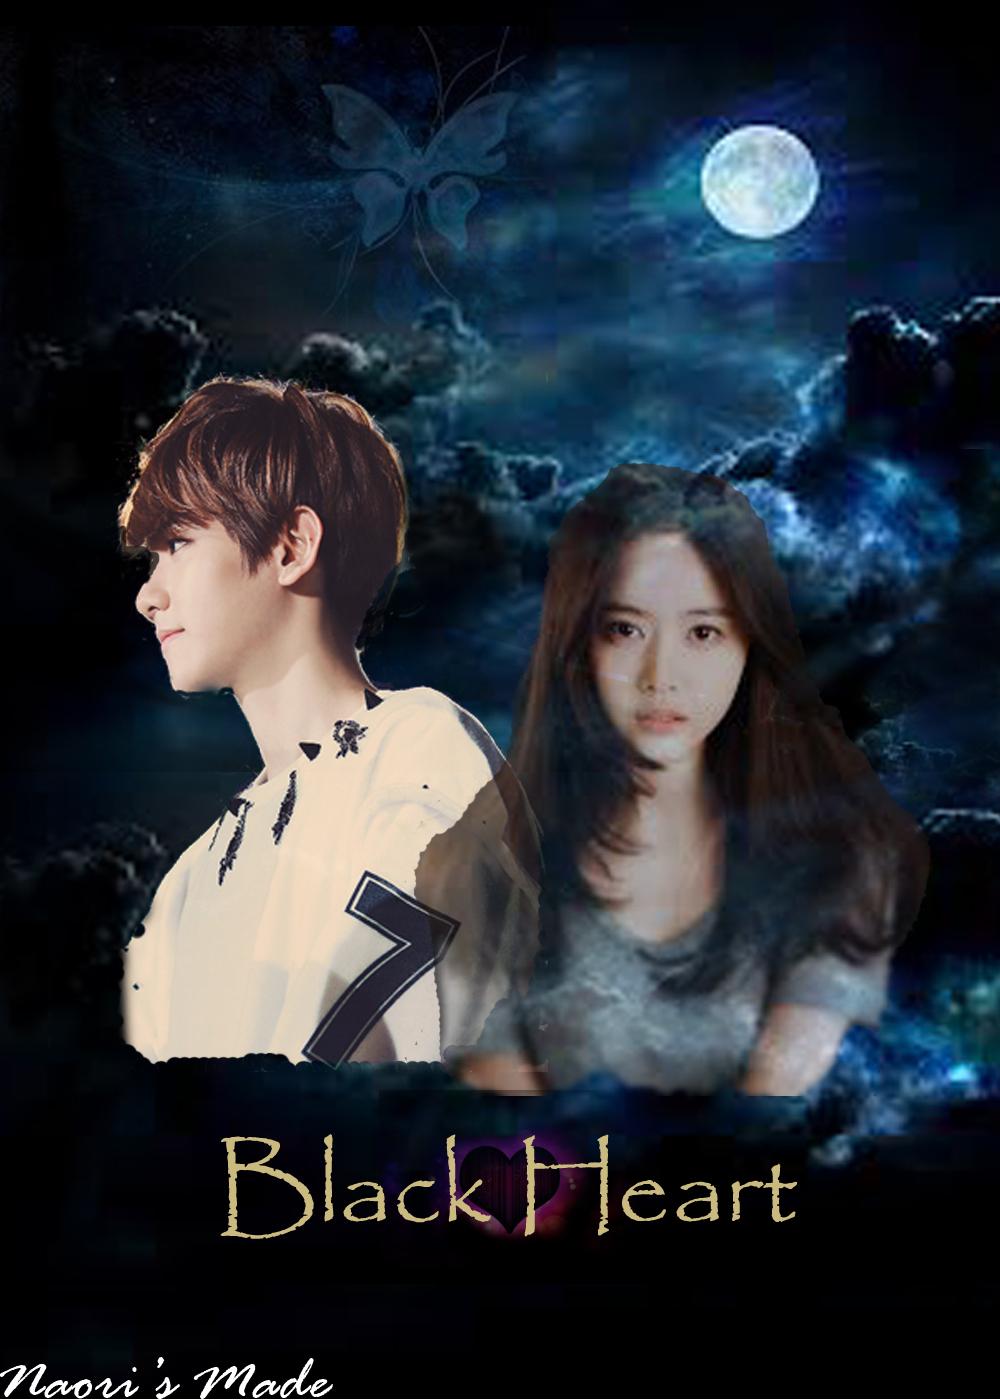 Black Heart Poster copy hj.jpg